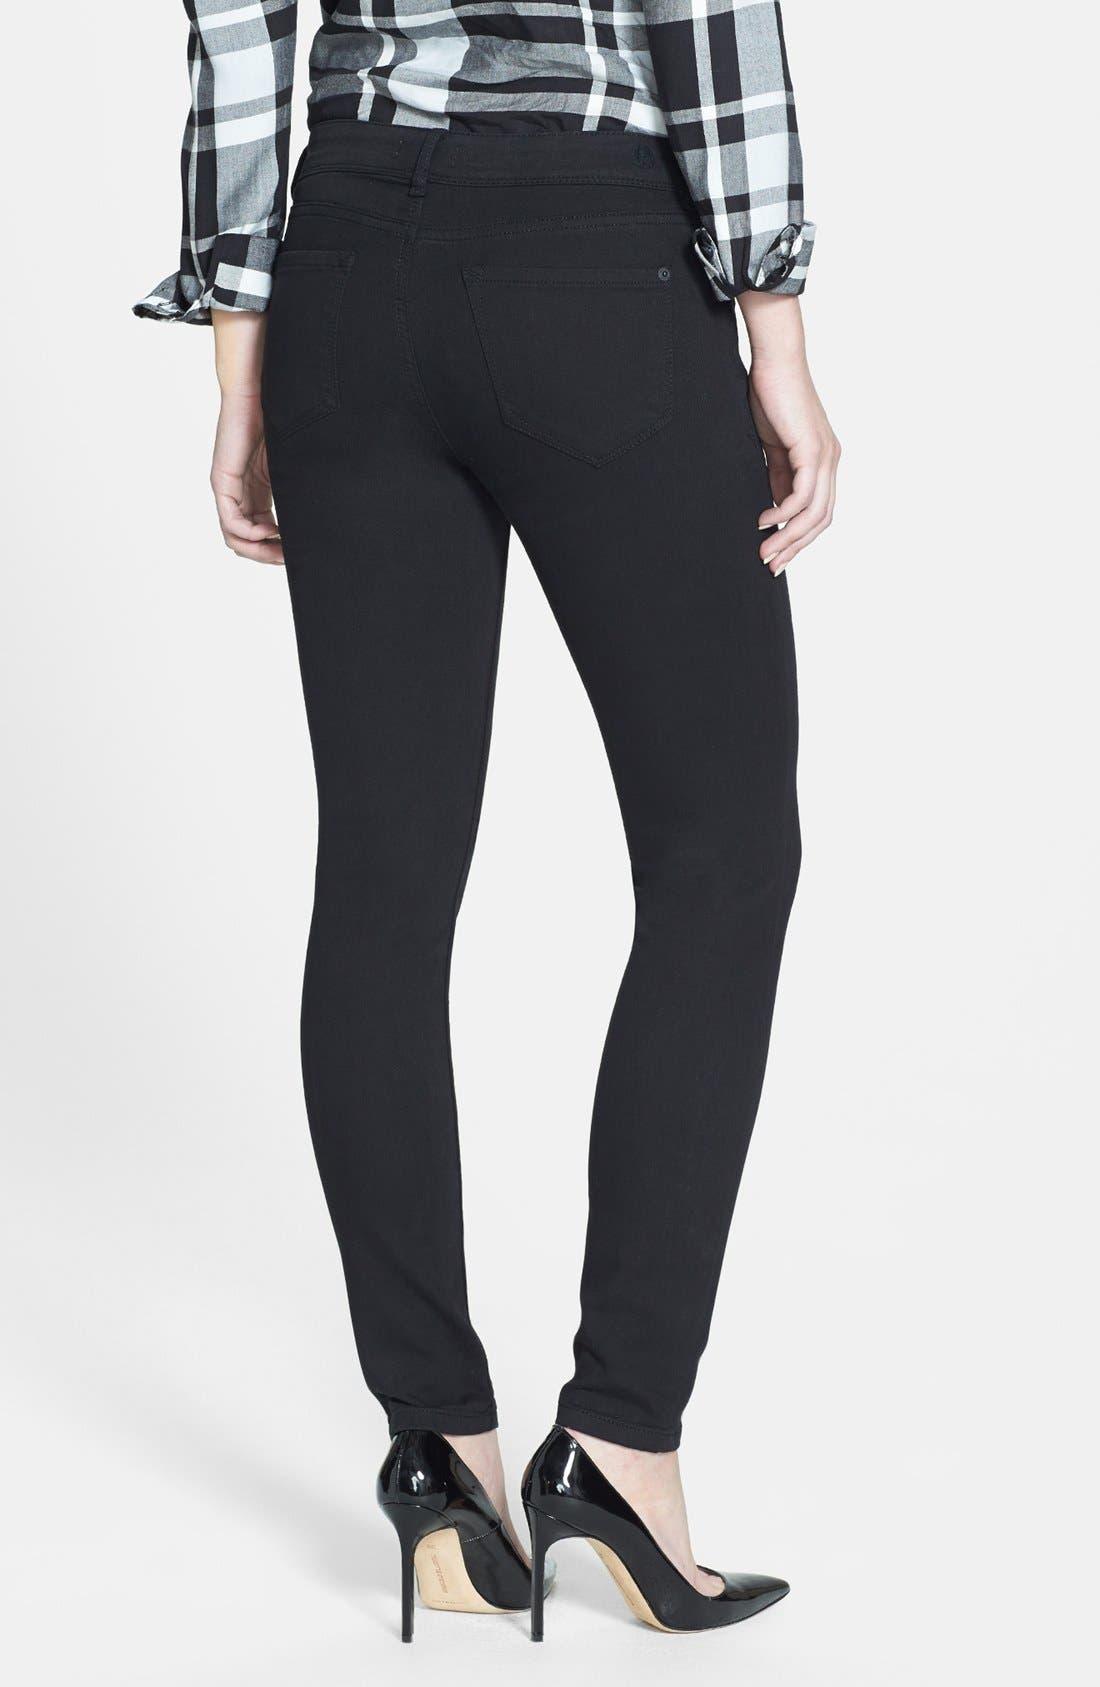 Alternate Image 2  - kensie 'You Look Pretty' Stretch Denim Skinny Jeans (Black)